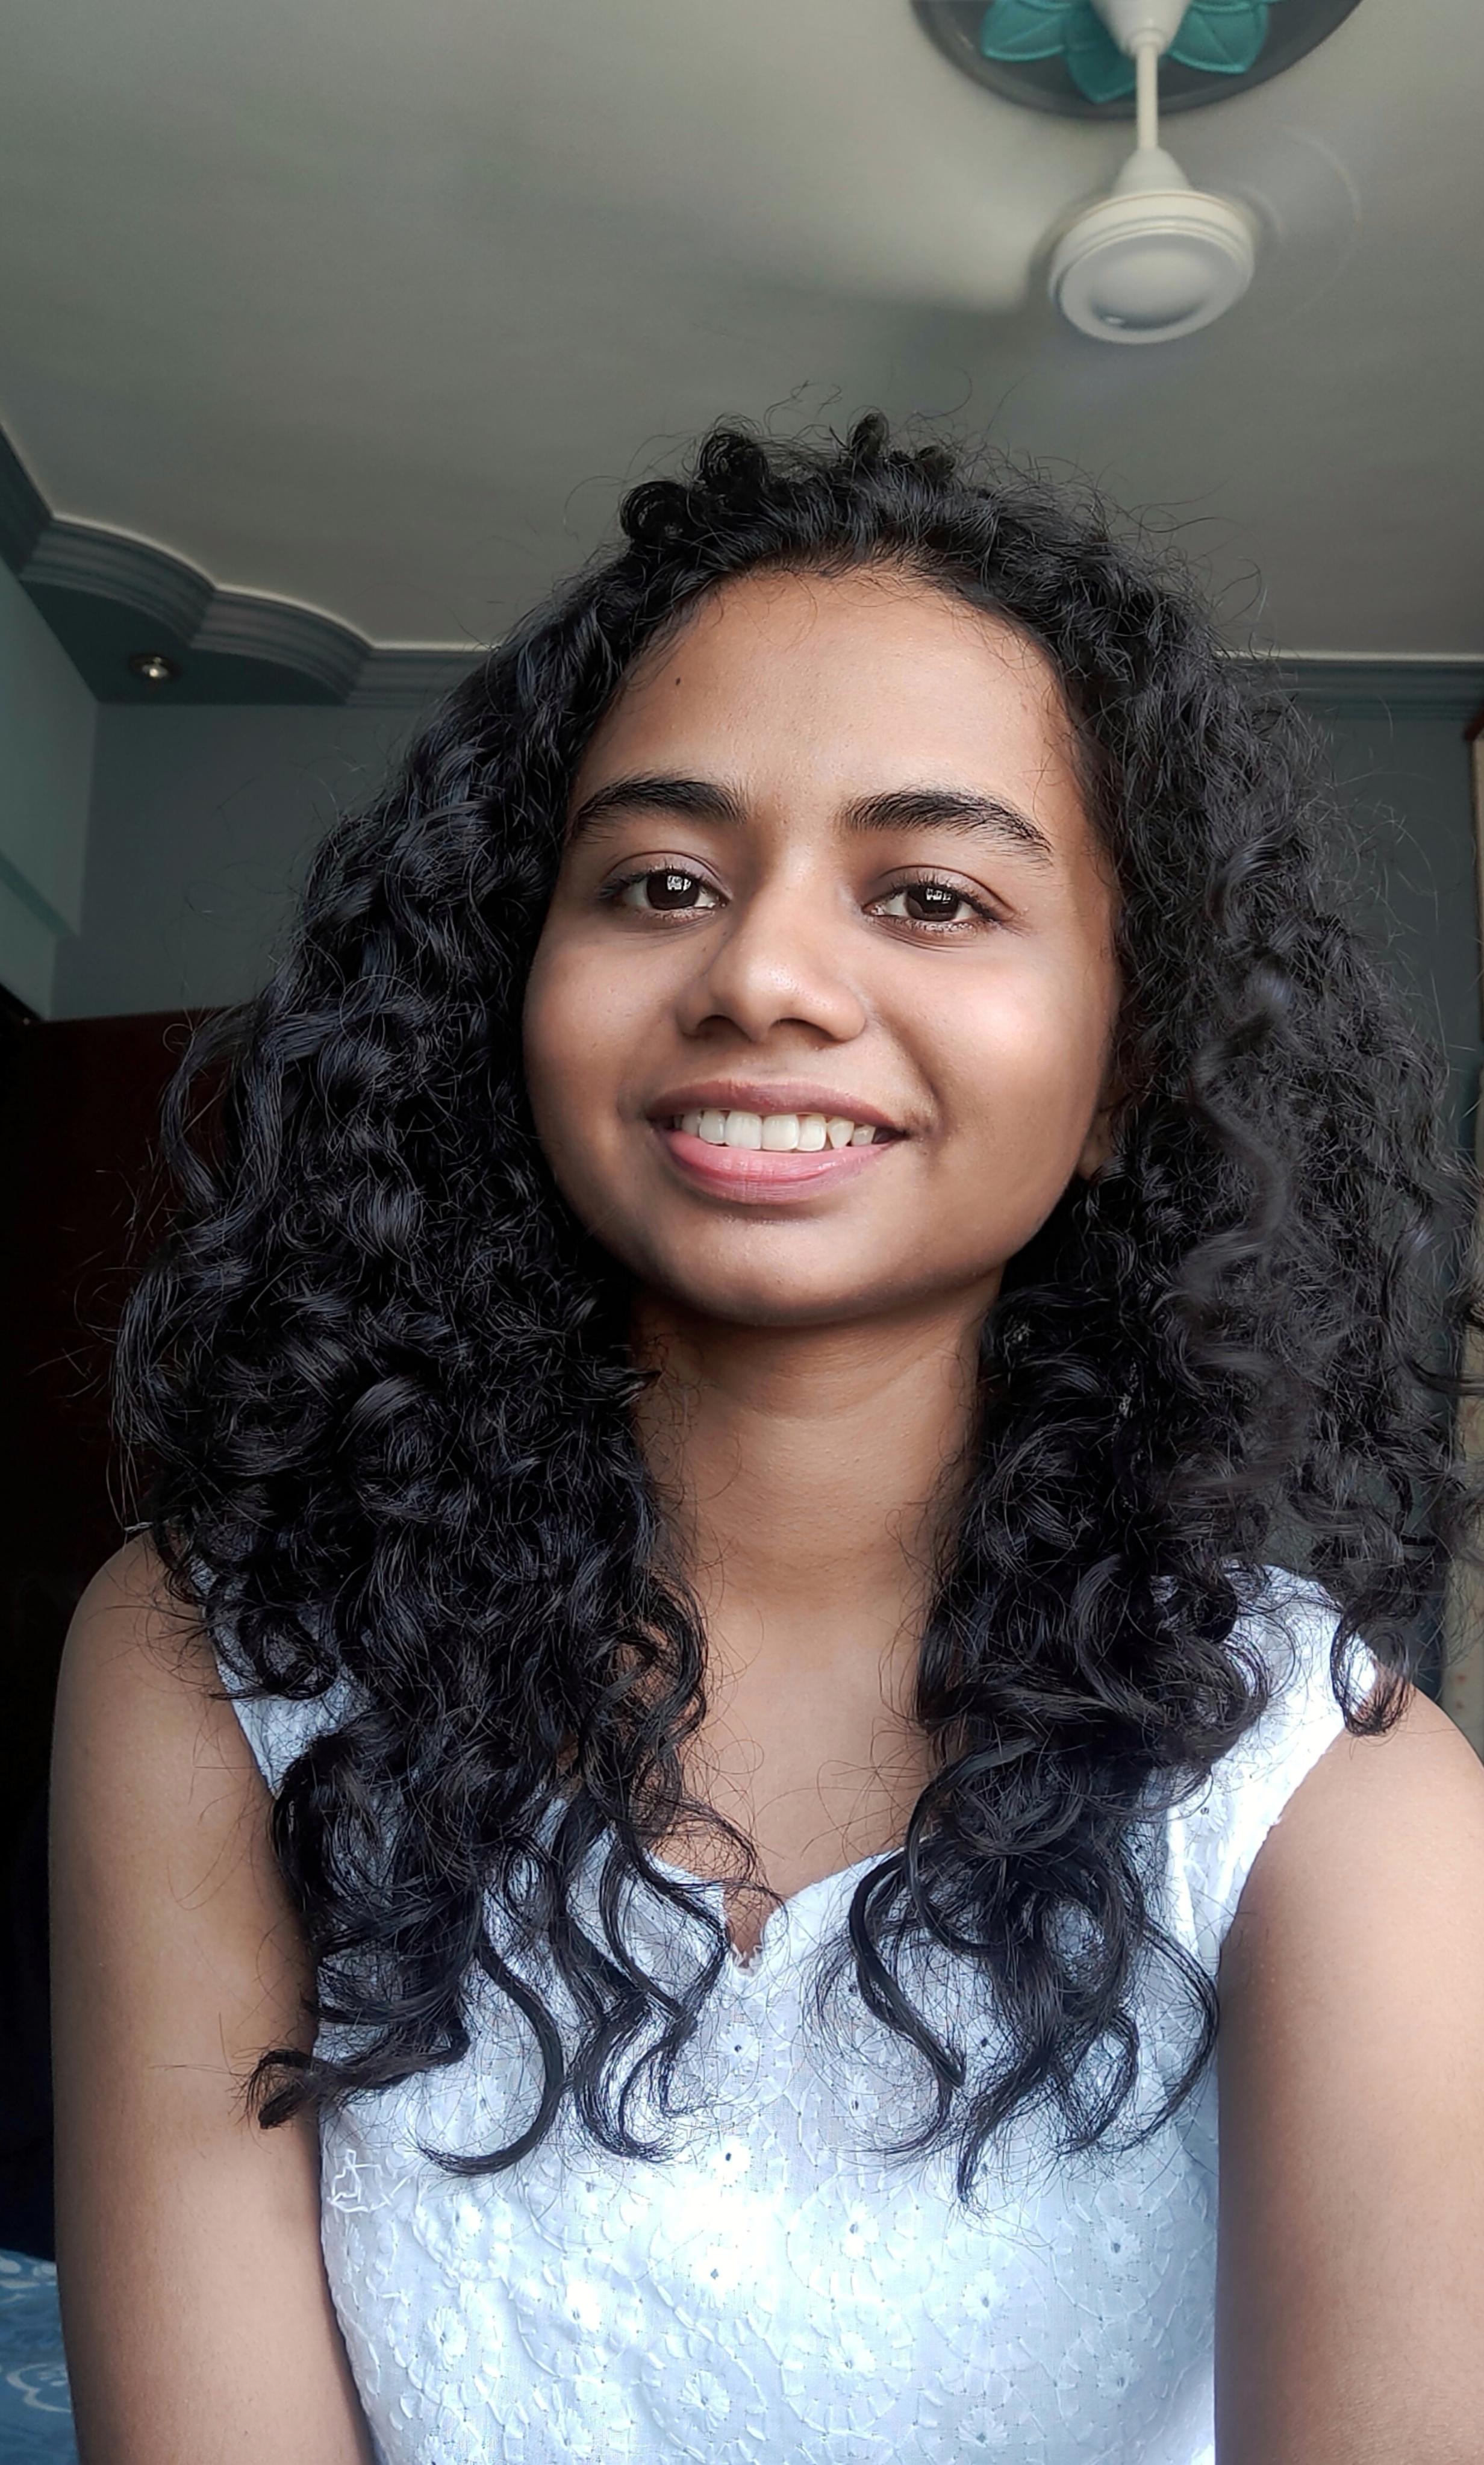 Image of Dhanashree Palav